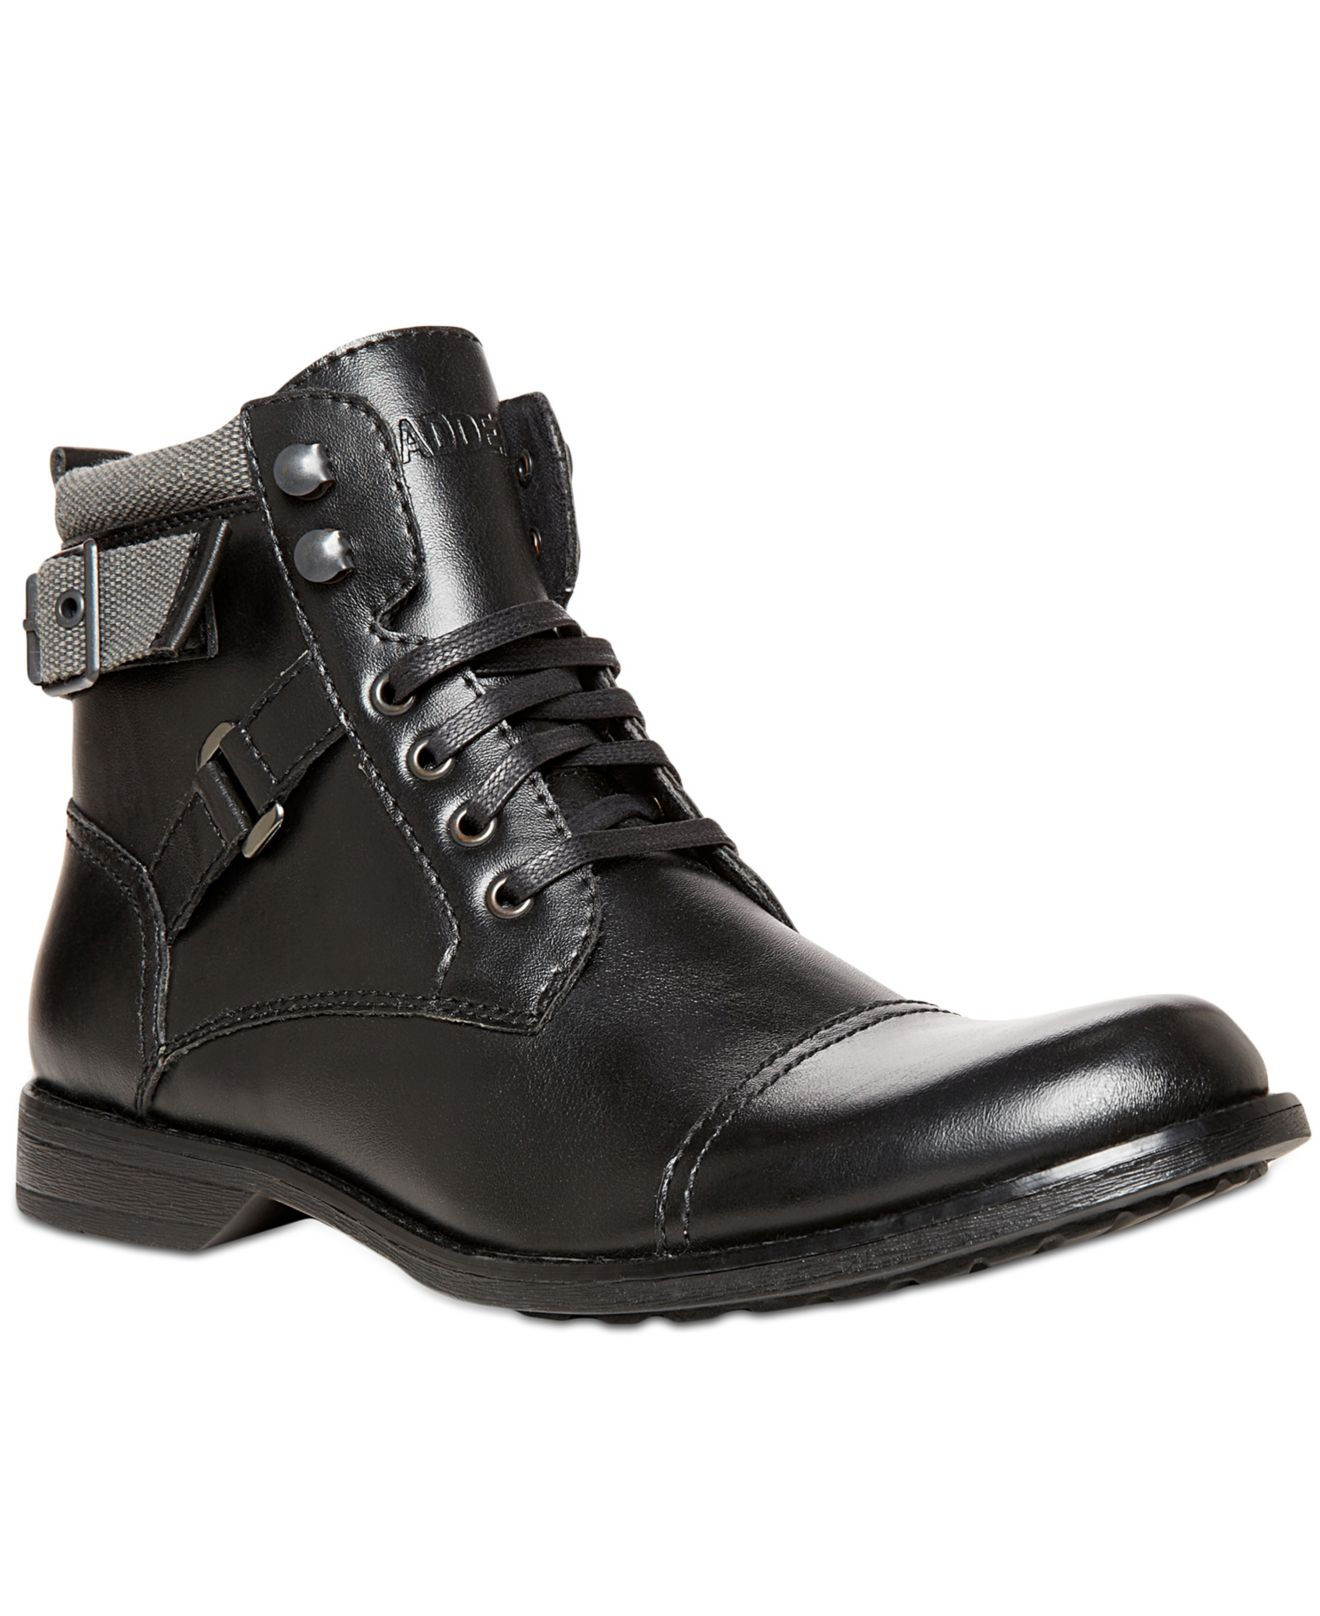 lyst steve madden madden kooper lace up boots in black